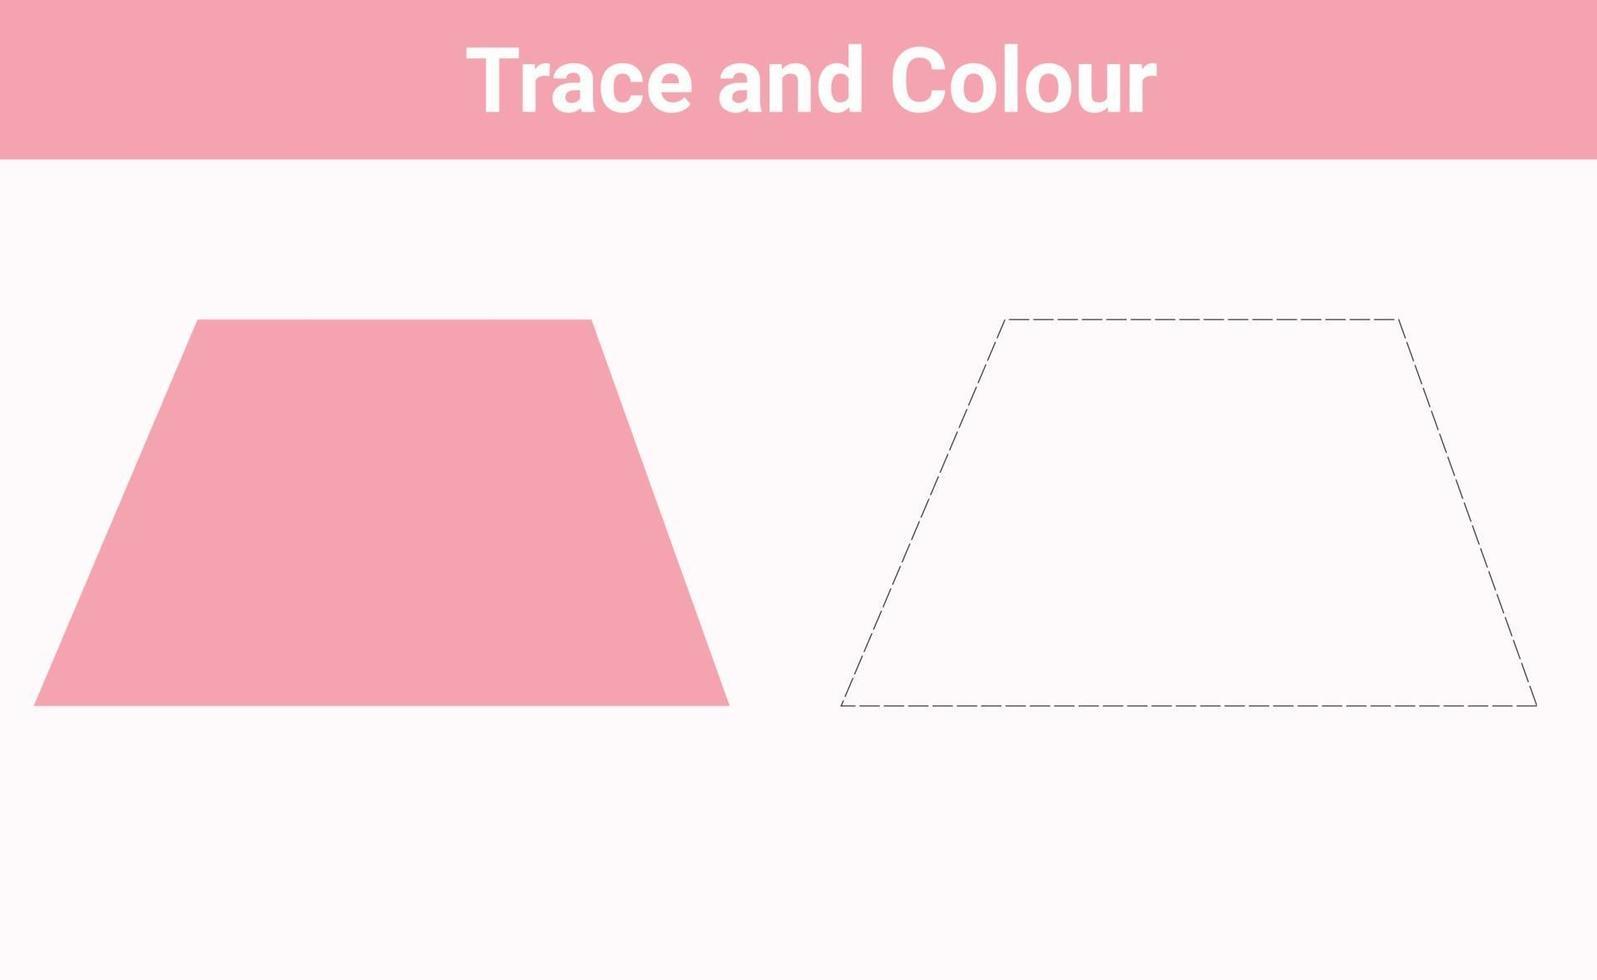 trace en kleur trapezoïde vrije vector